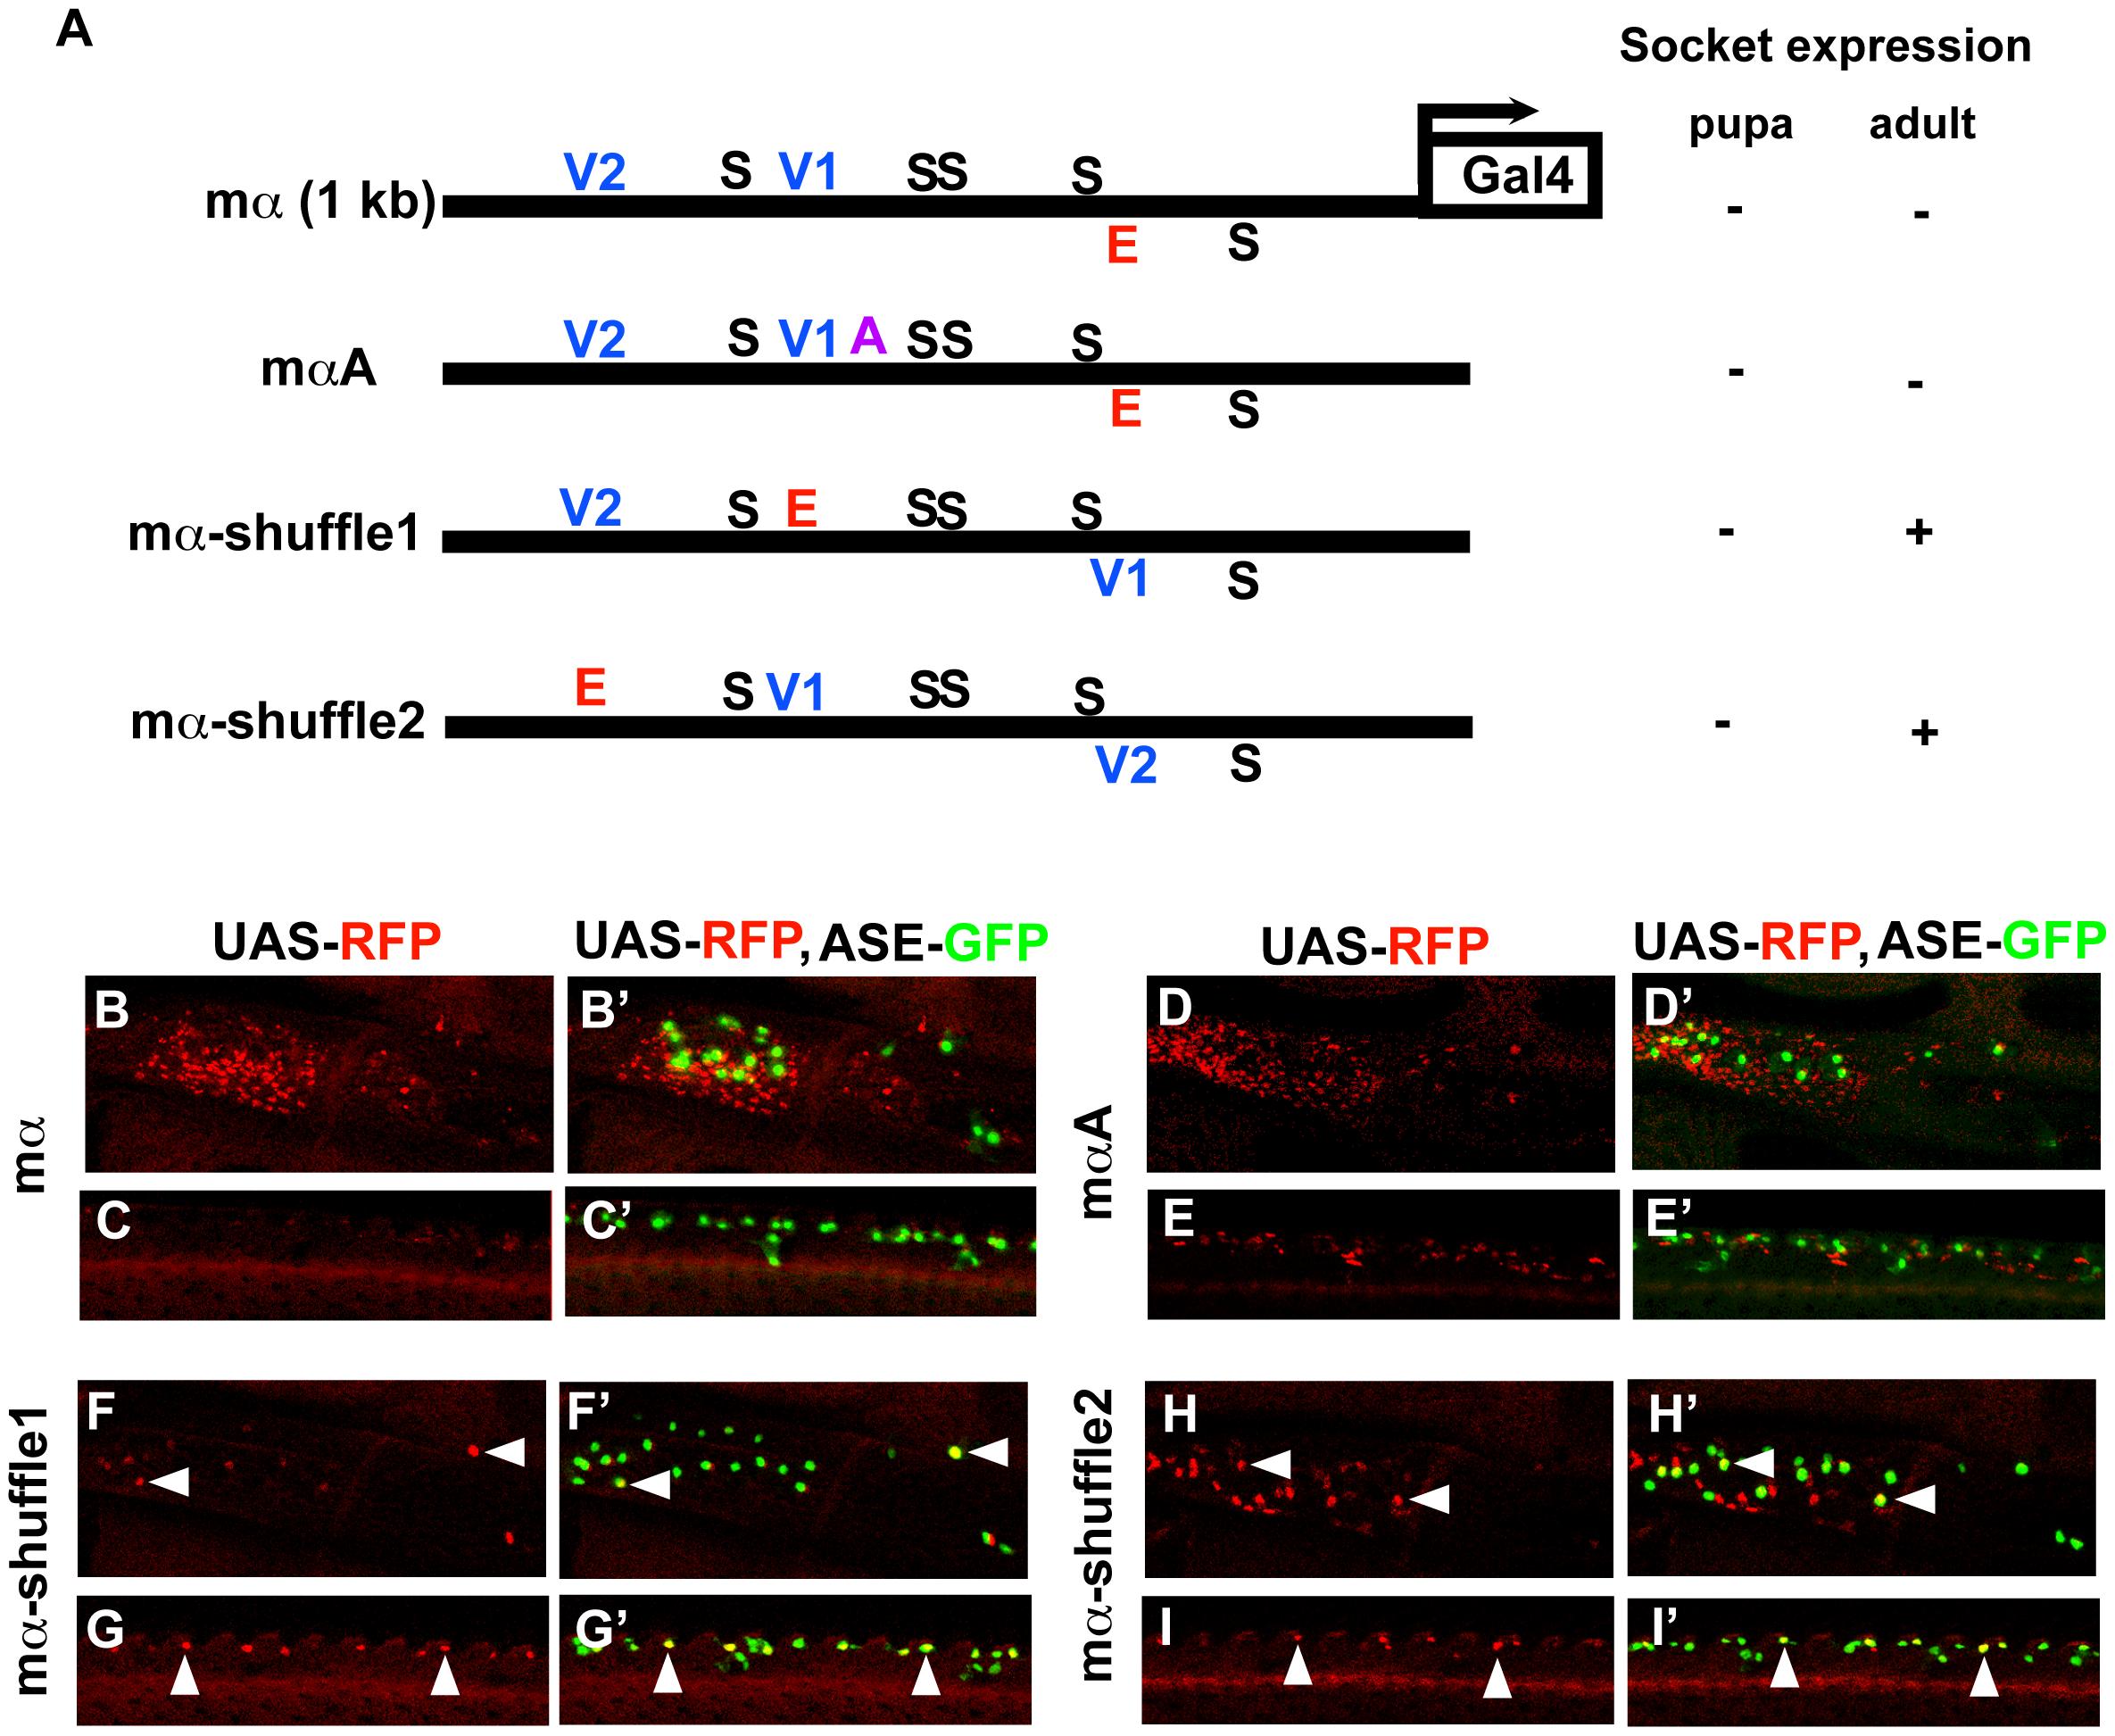 Motif rearrangement in the mα enhancer yields ectopic activity in adult socket cells.